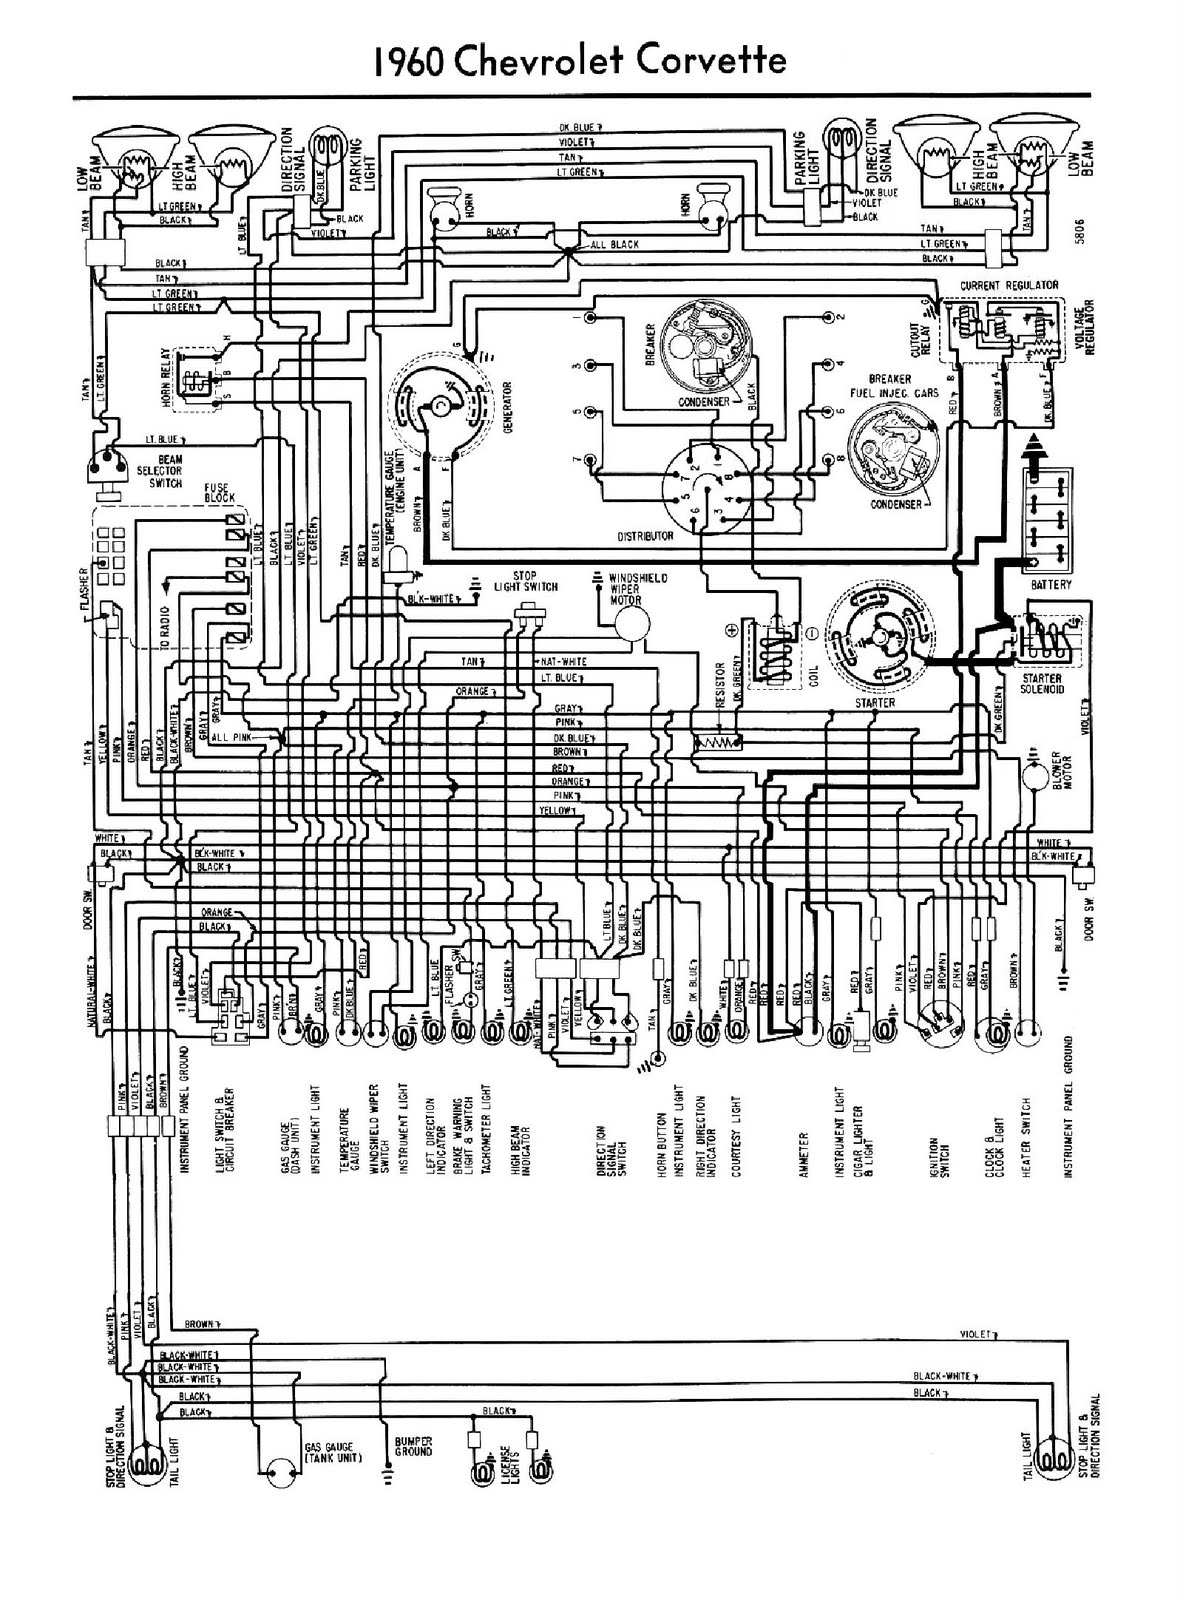 Free Auto Wiring Diagram: 1960 Chevrolet Corvette Wiring